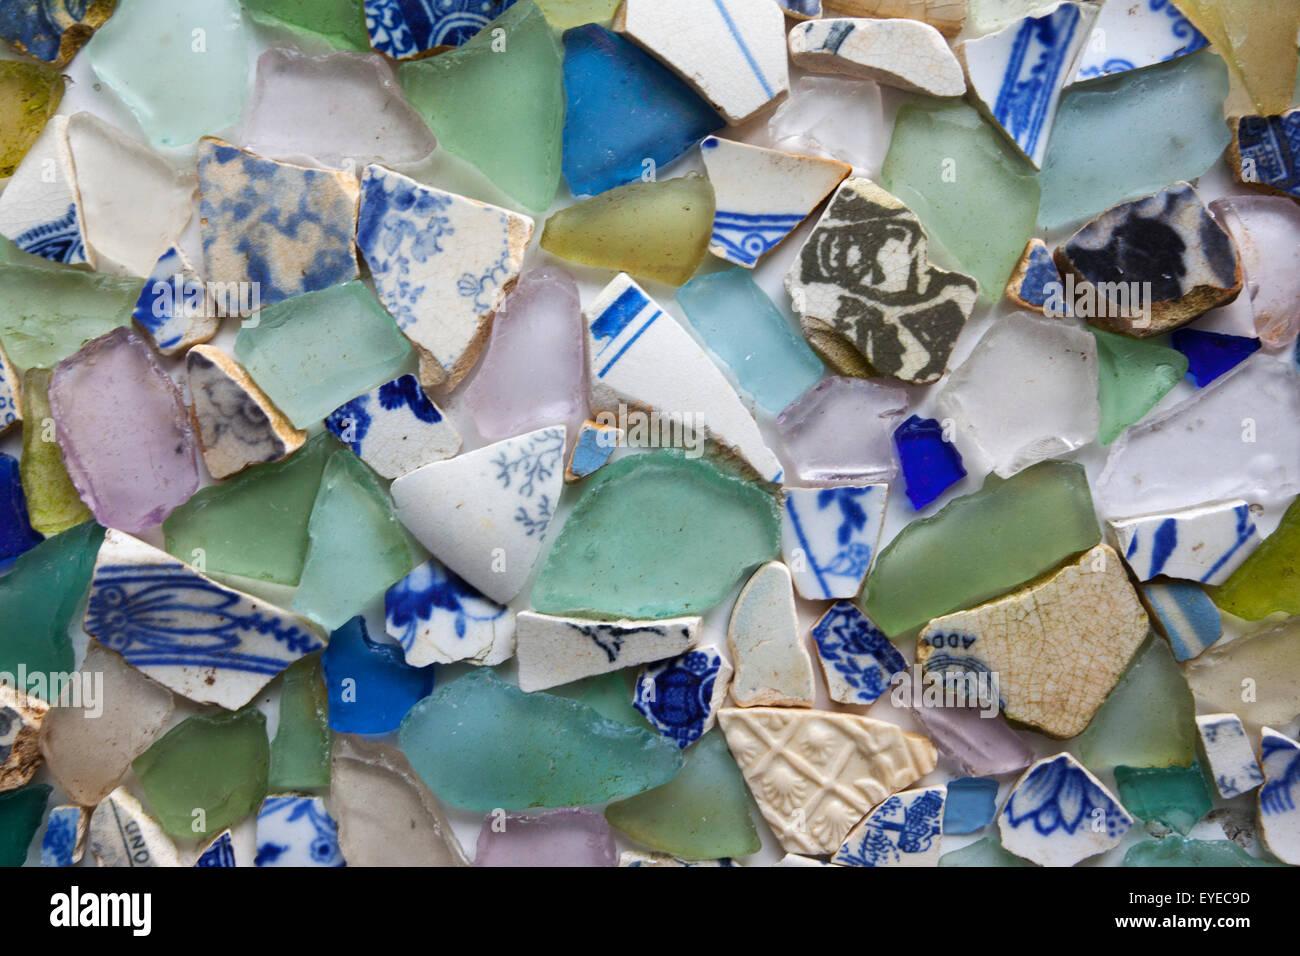 Bits of coloured glass and broken crockery found when beachcombing in Scotland, UK - Stock Image